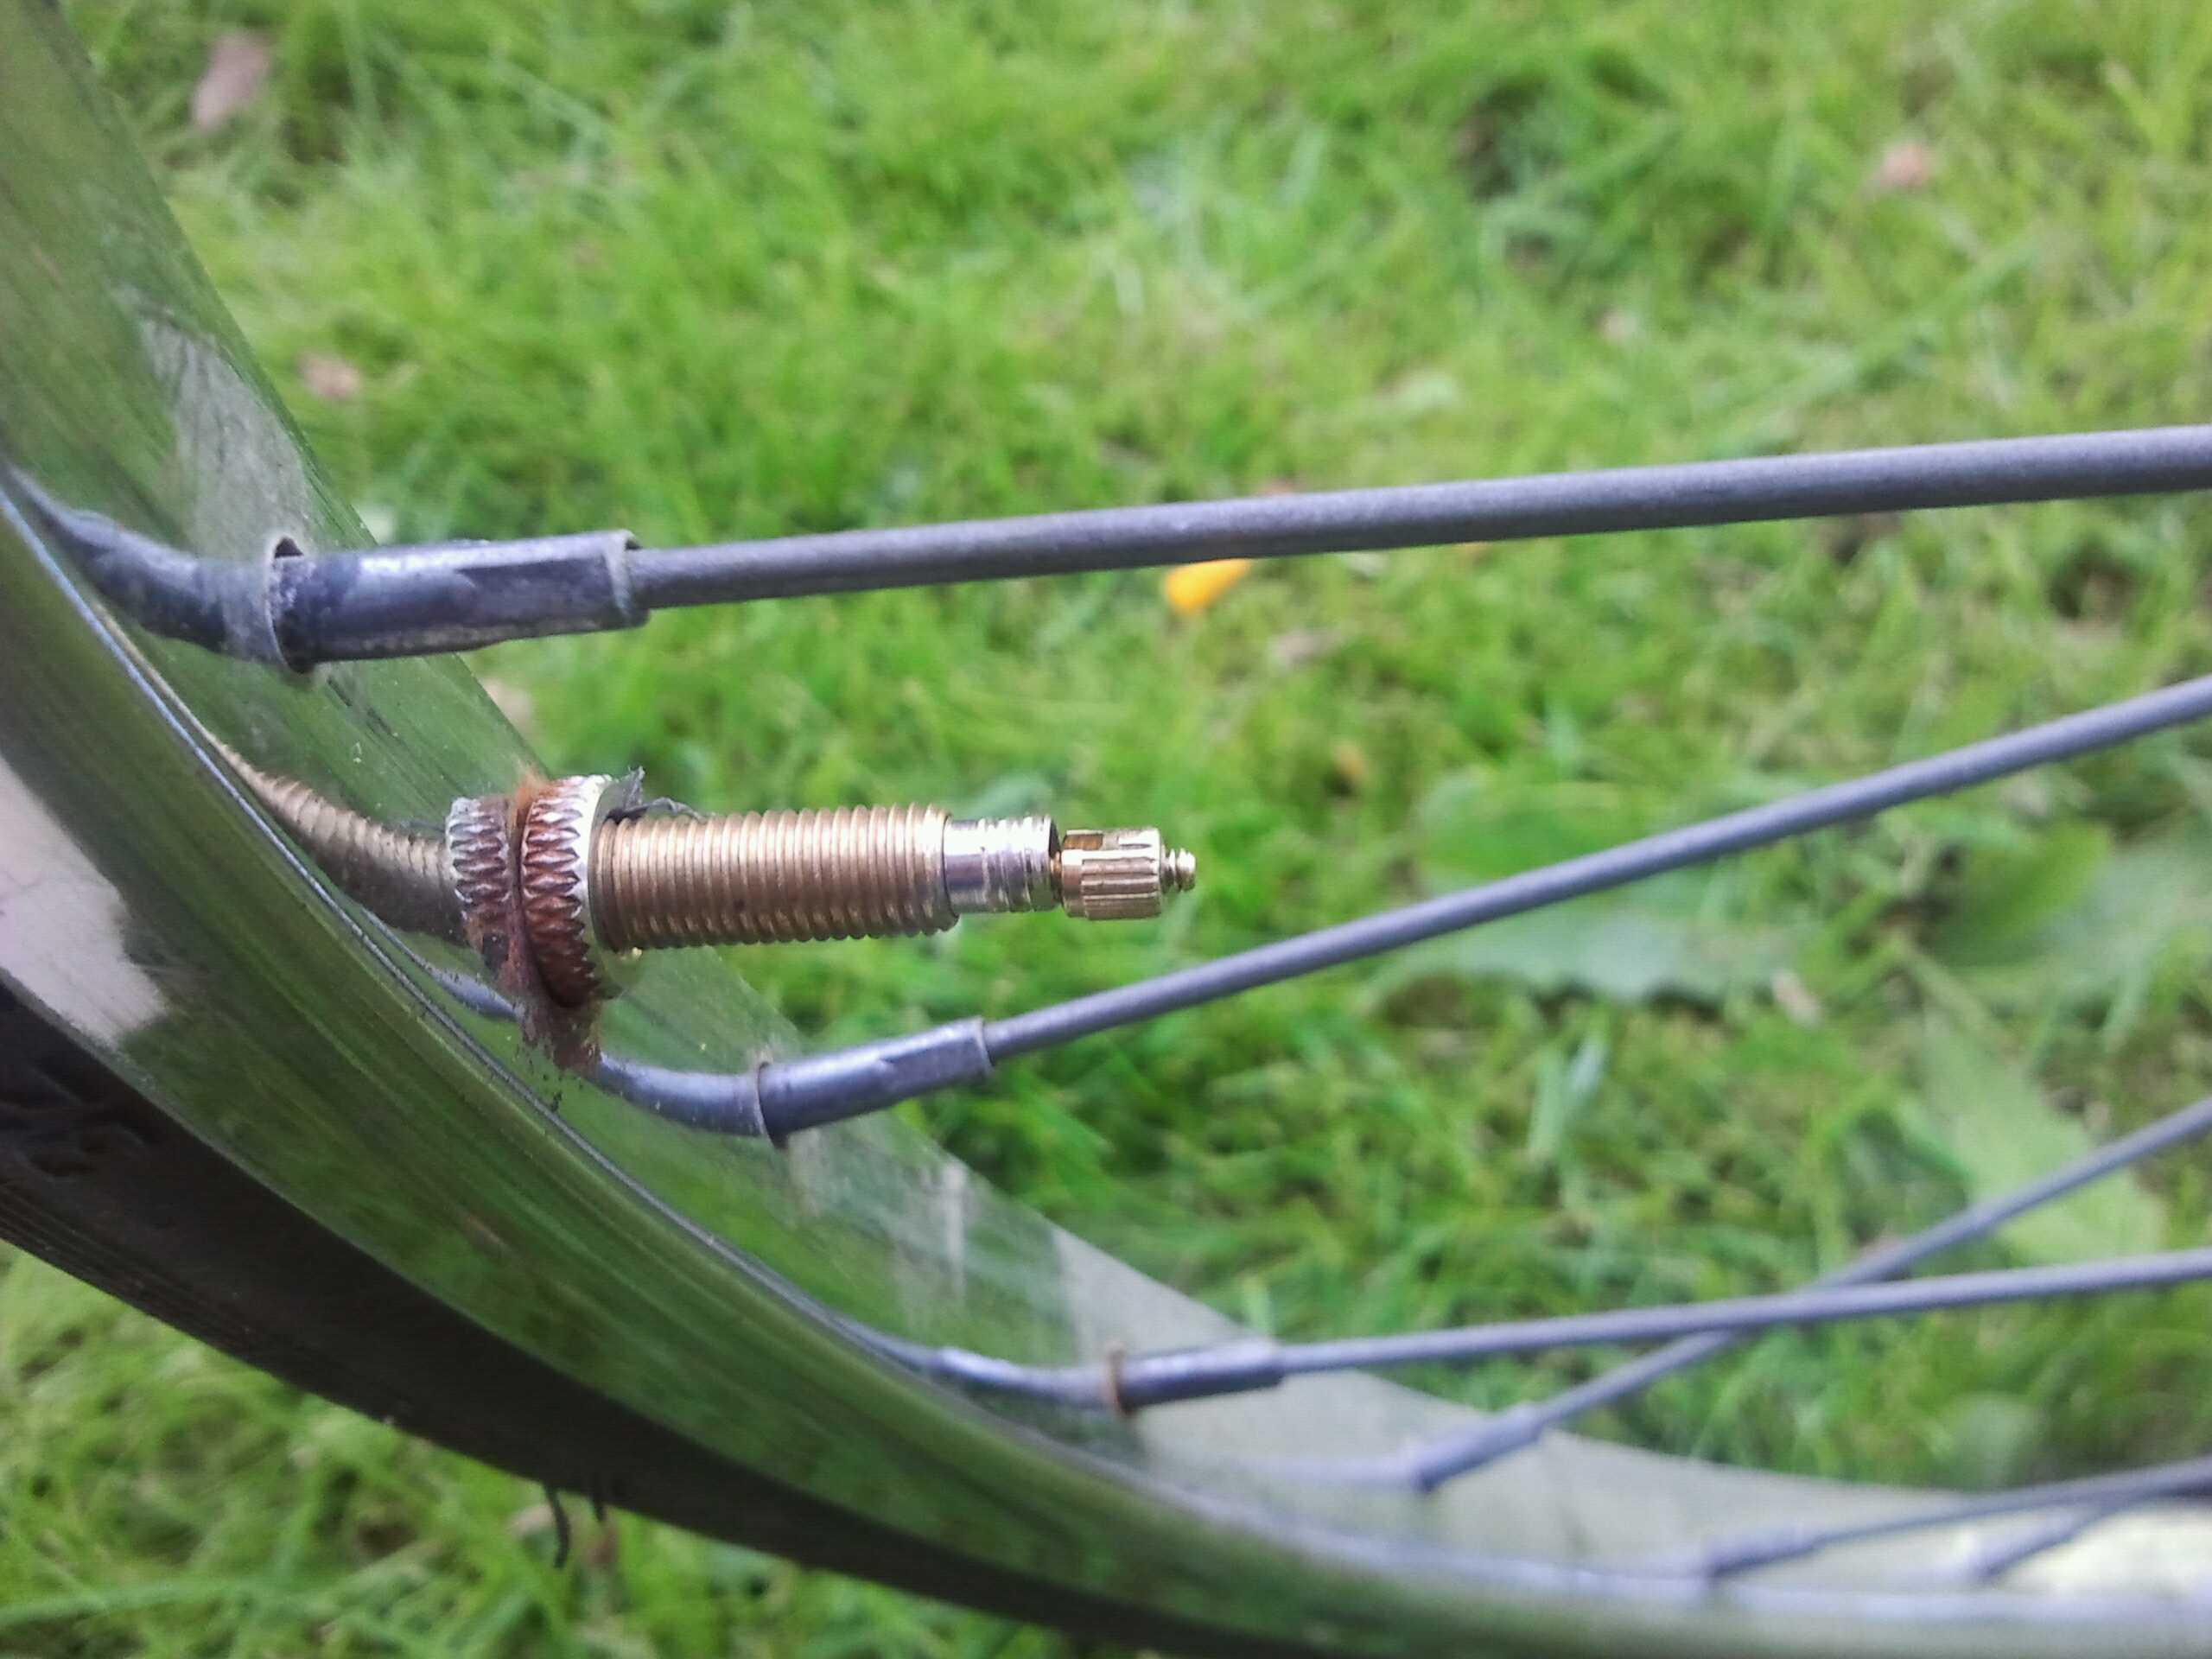 Valve of a bike tire